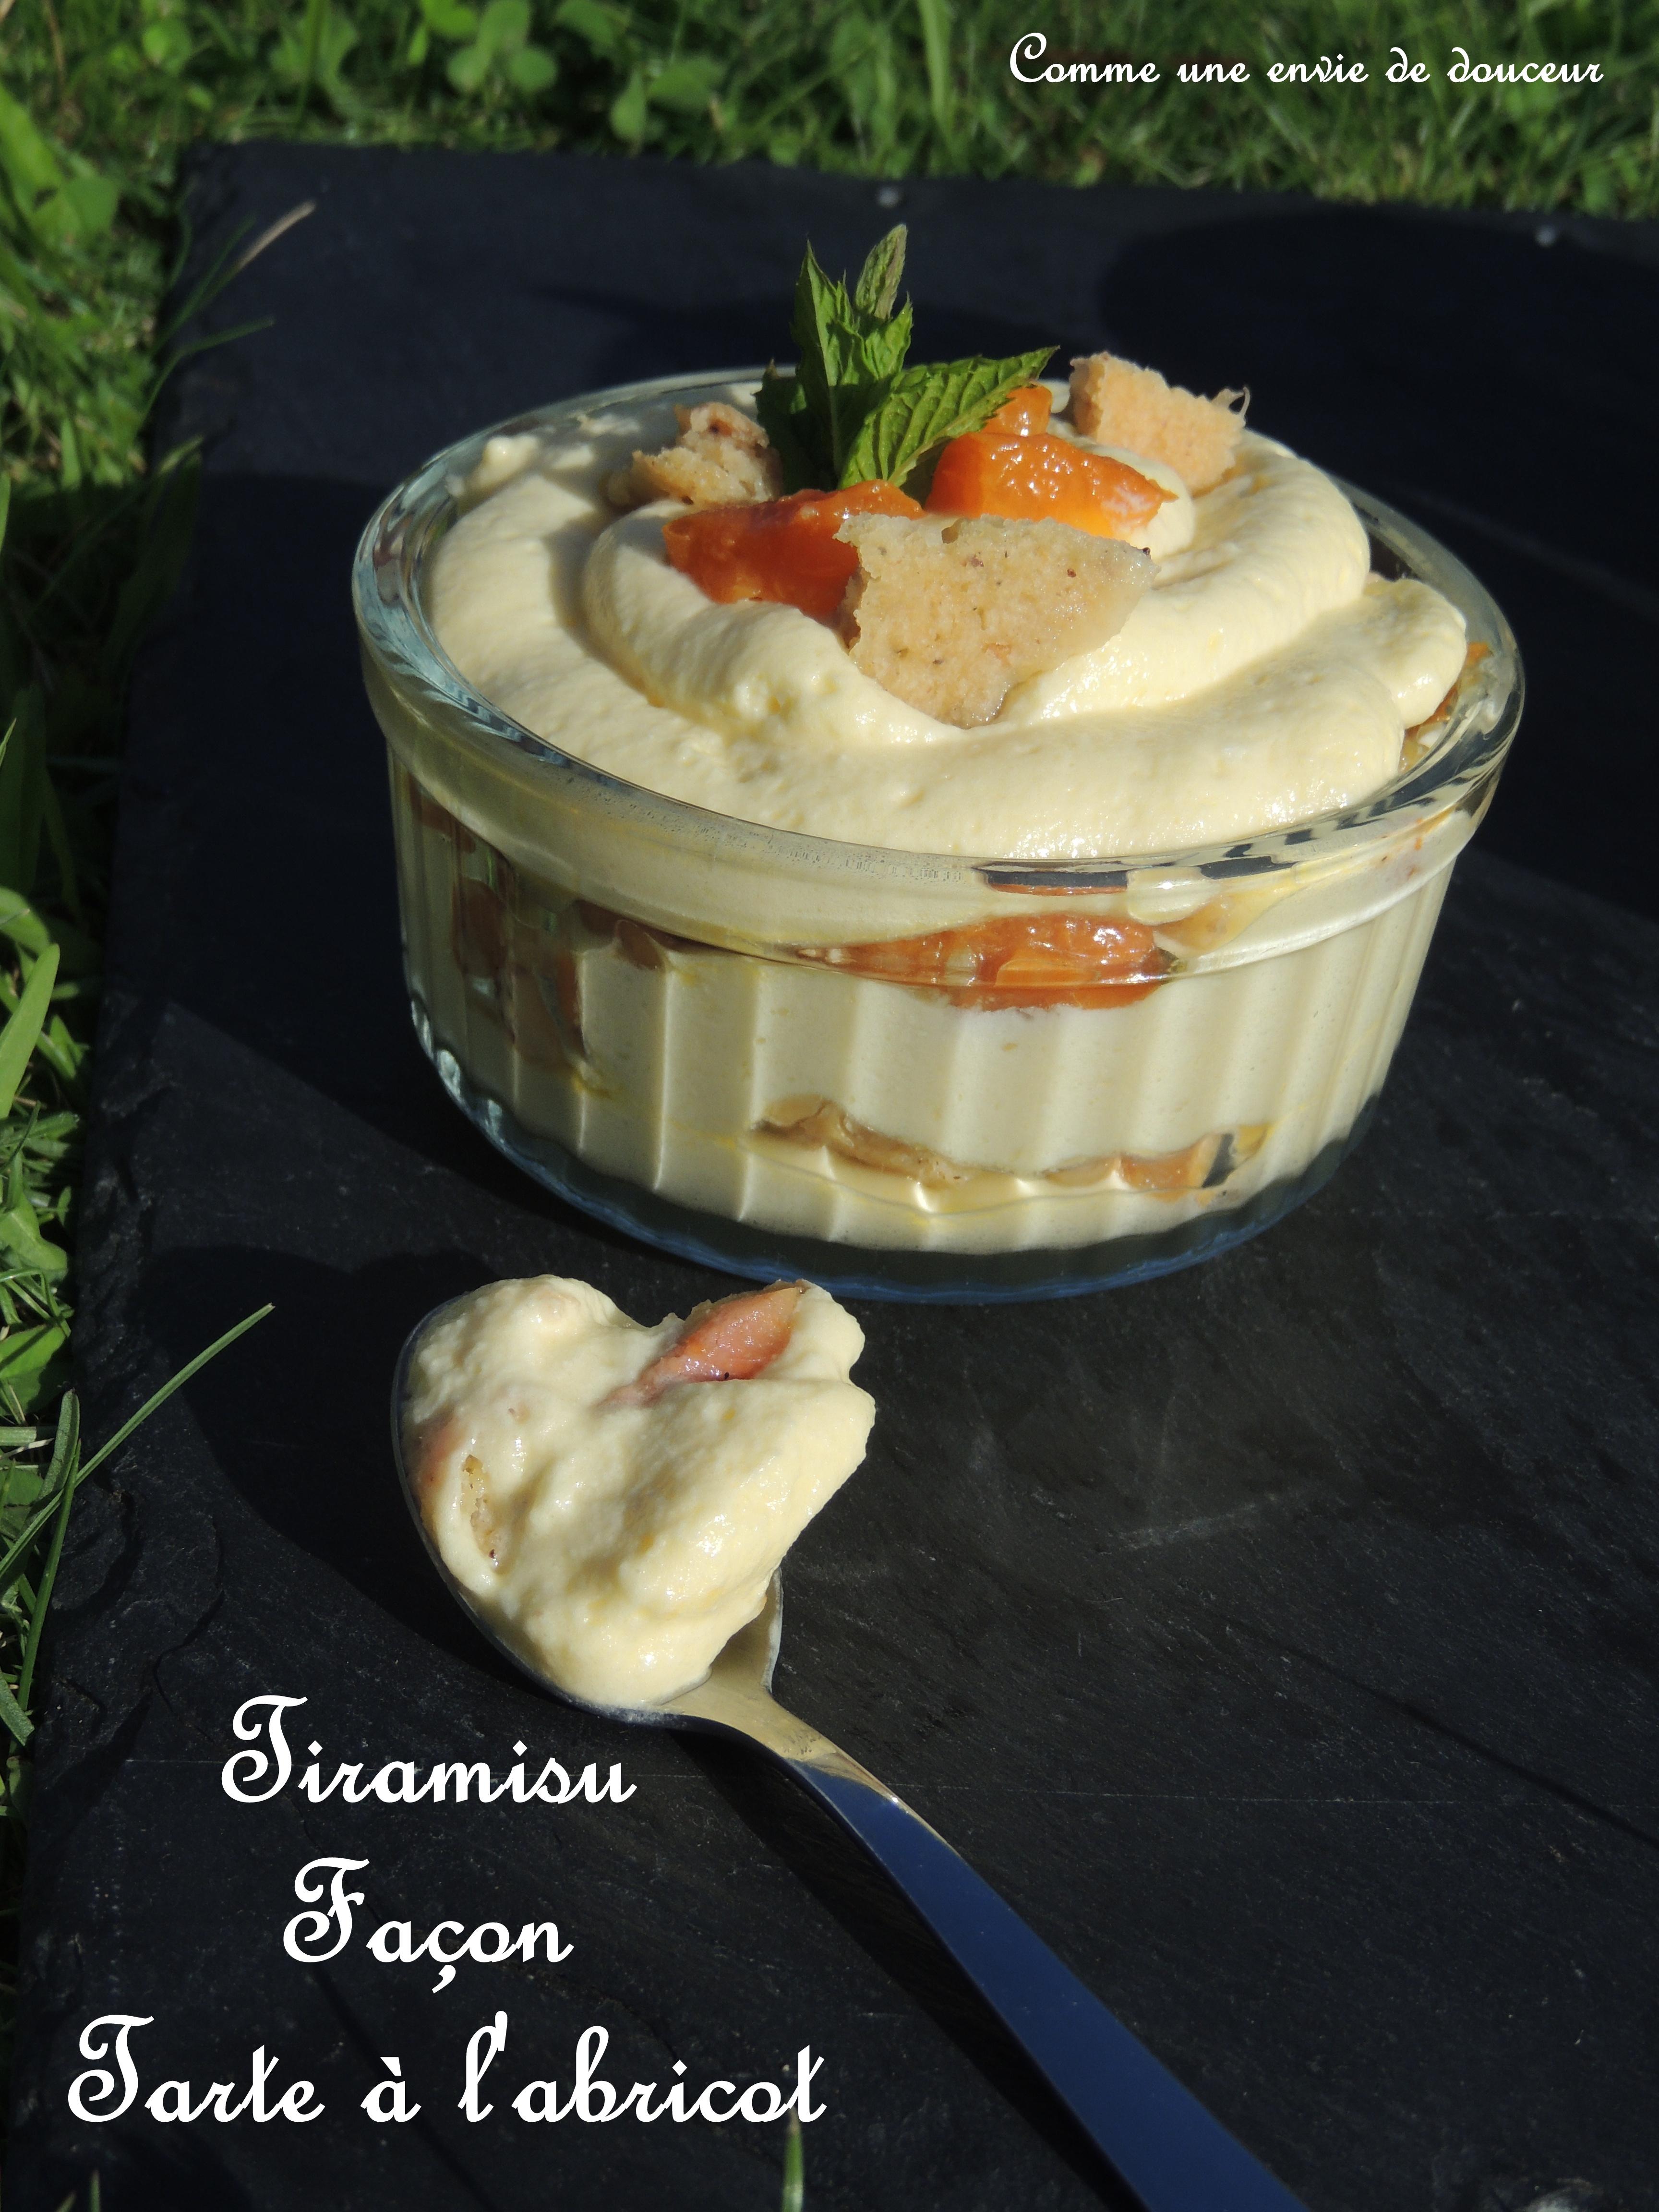 Tiramisu abricot rhubarbe – Apricot rhubarb tiramisu